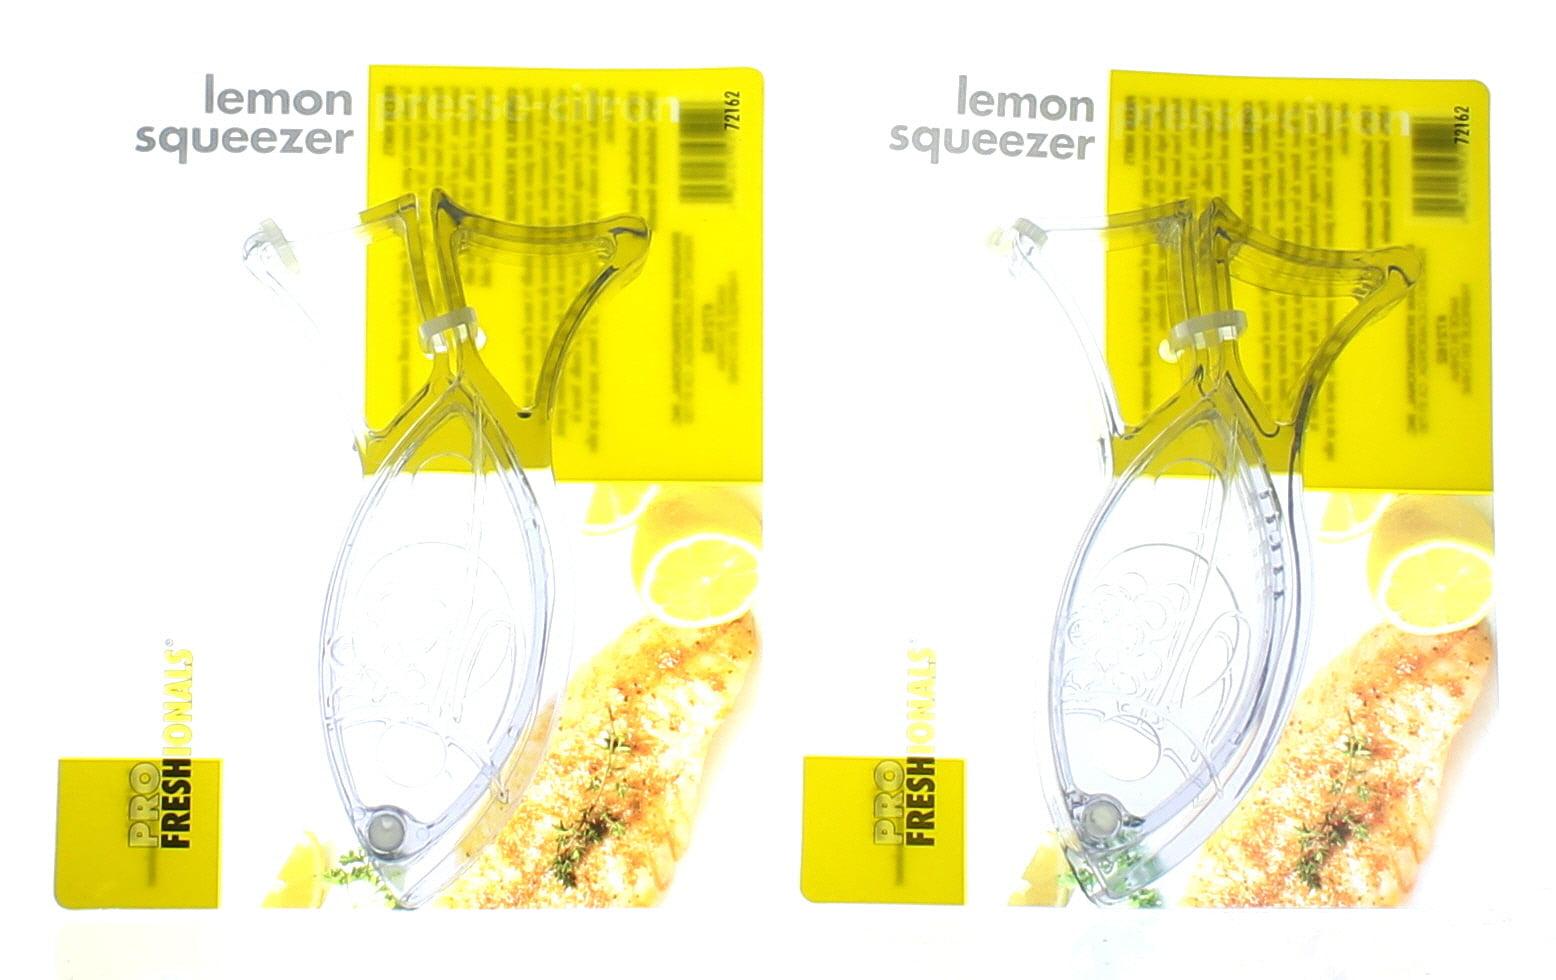 RSVP Acrylic /& Stainless Steel Fish Lemon Wedge Squeezer Juicer Kitchen Tool